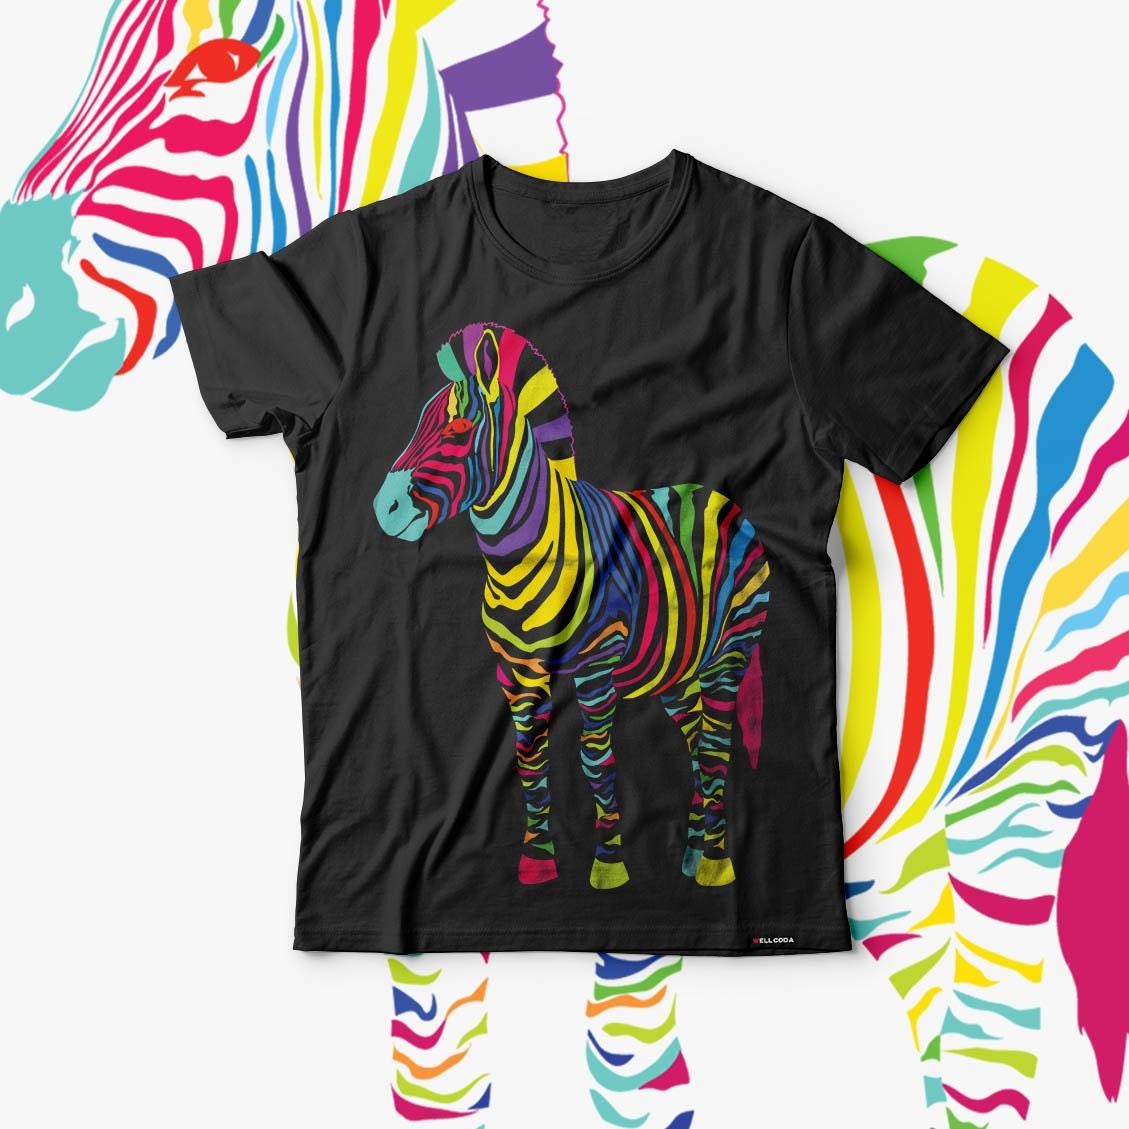 Zebra Color Funny Animal Fun Men Black Tshirt S5XL NEW  Wellcoda y1540